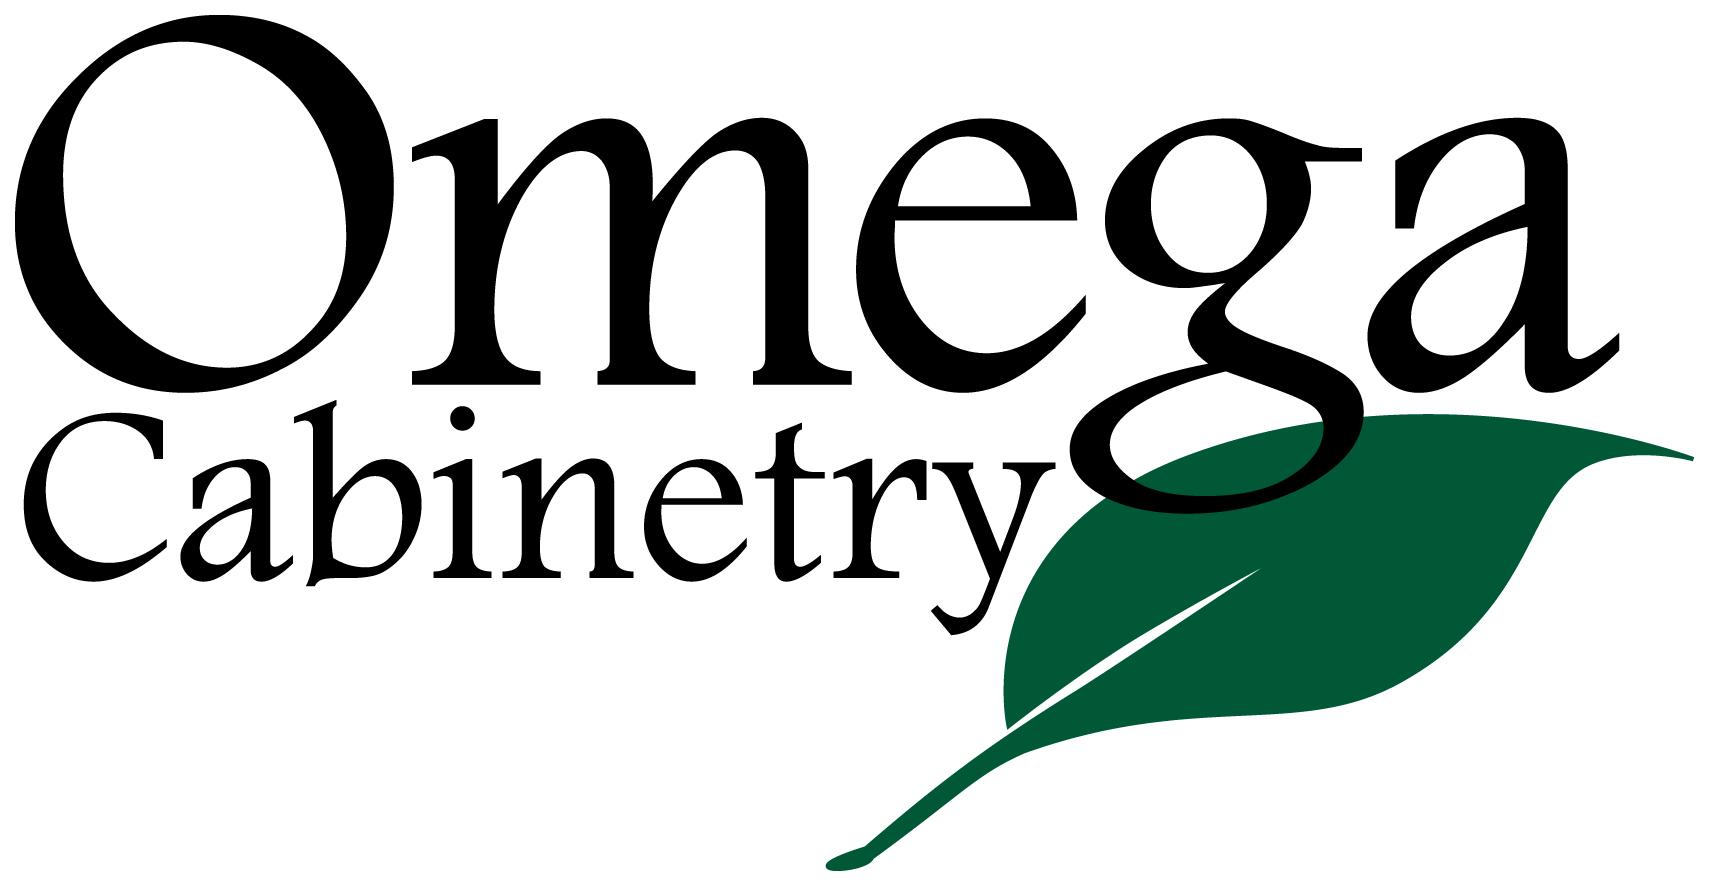 OmegaCabinetry-Logo.jpg